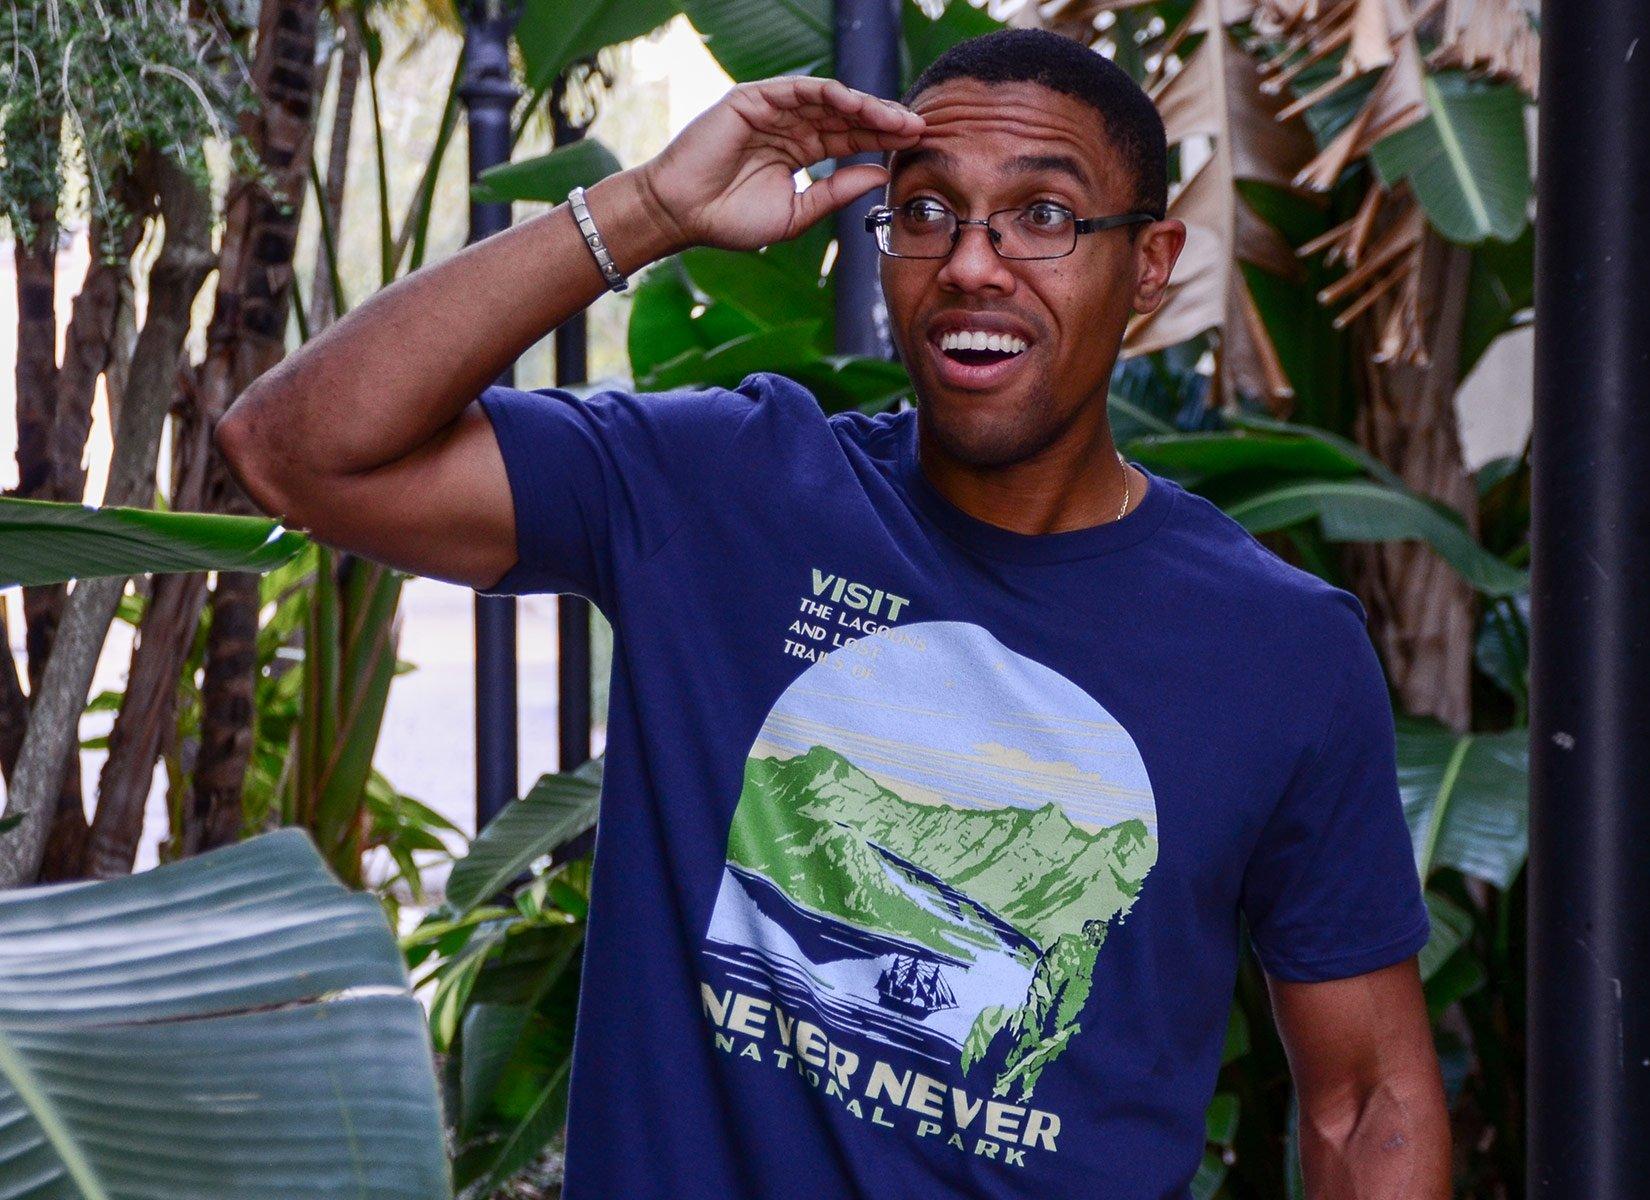 Never Never National Park on Mens T-Shirt